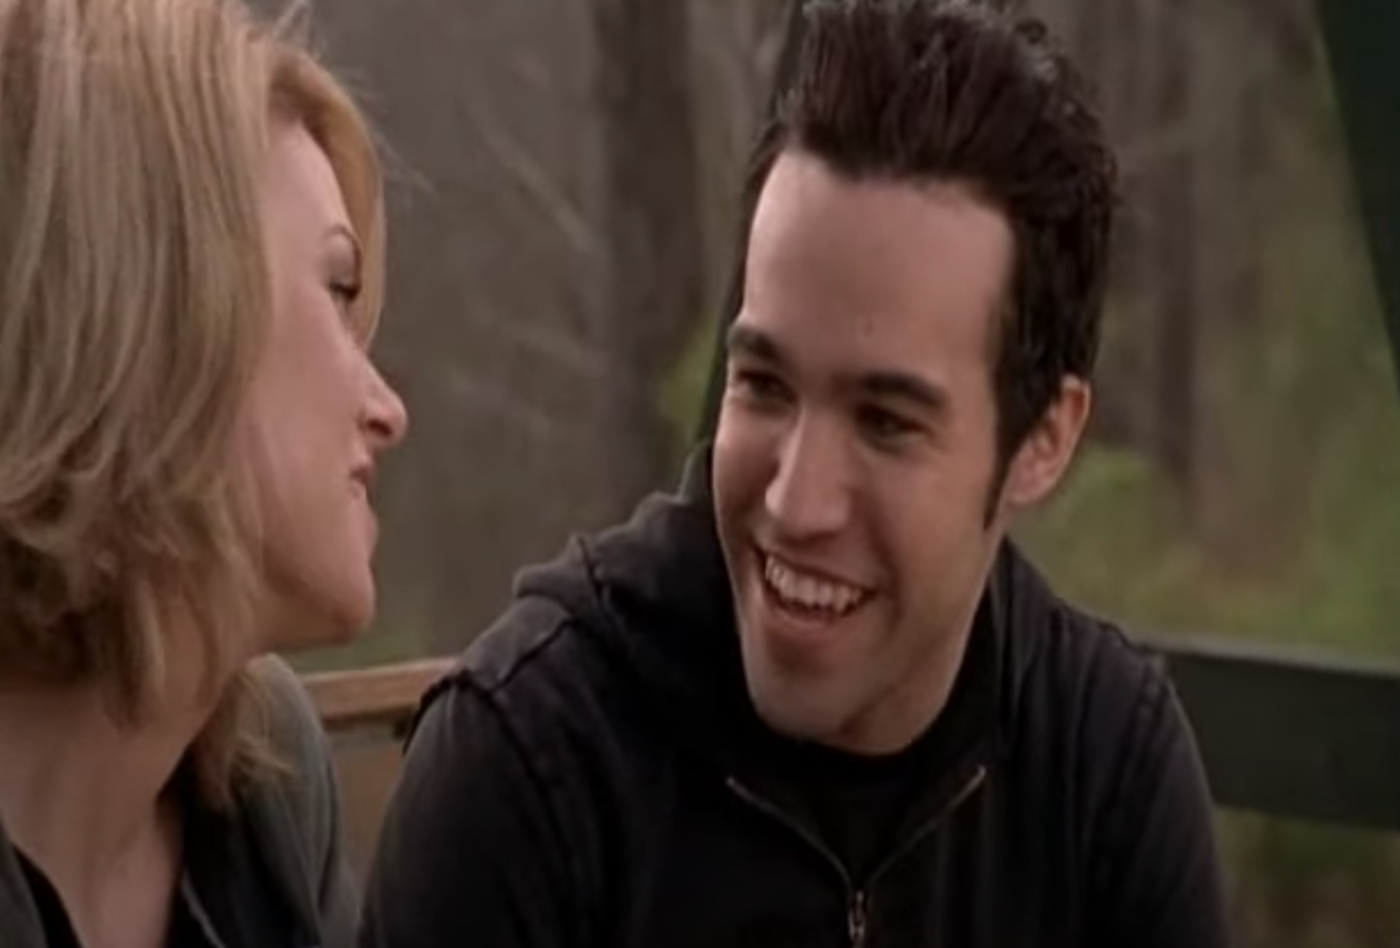 Pete talking to Peyton on a wooden swing bench